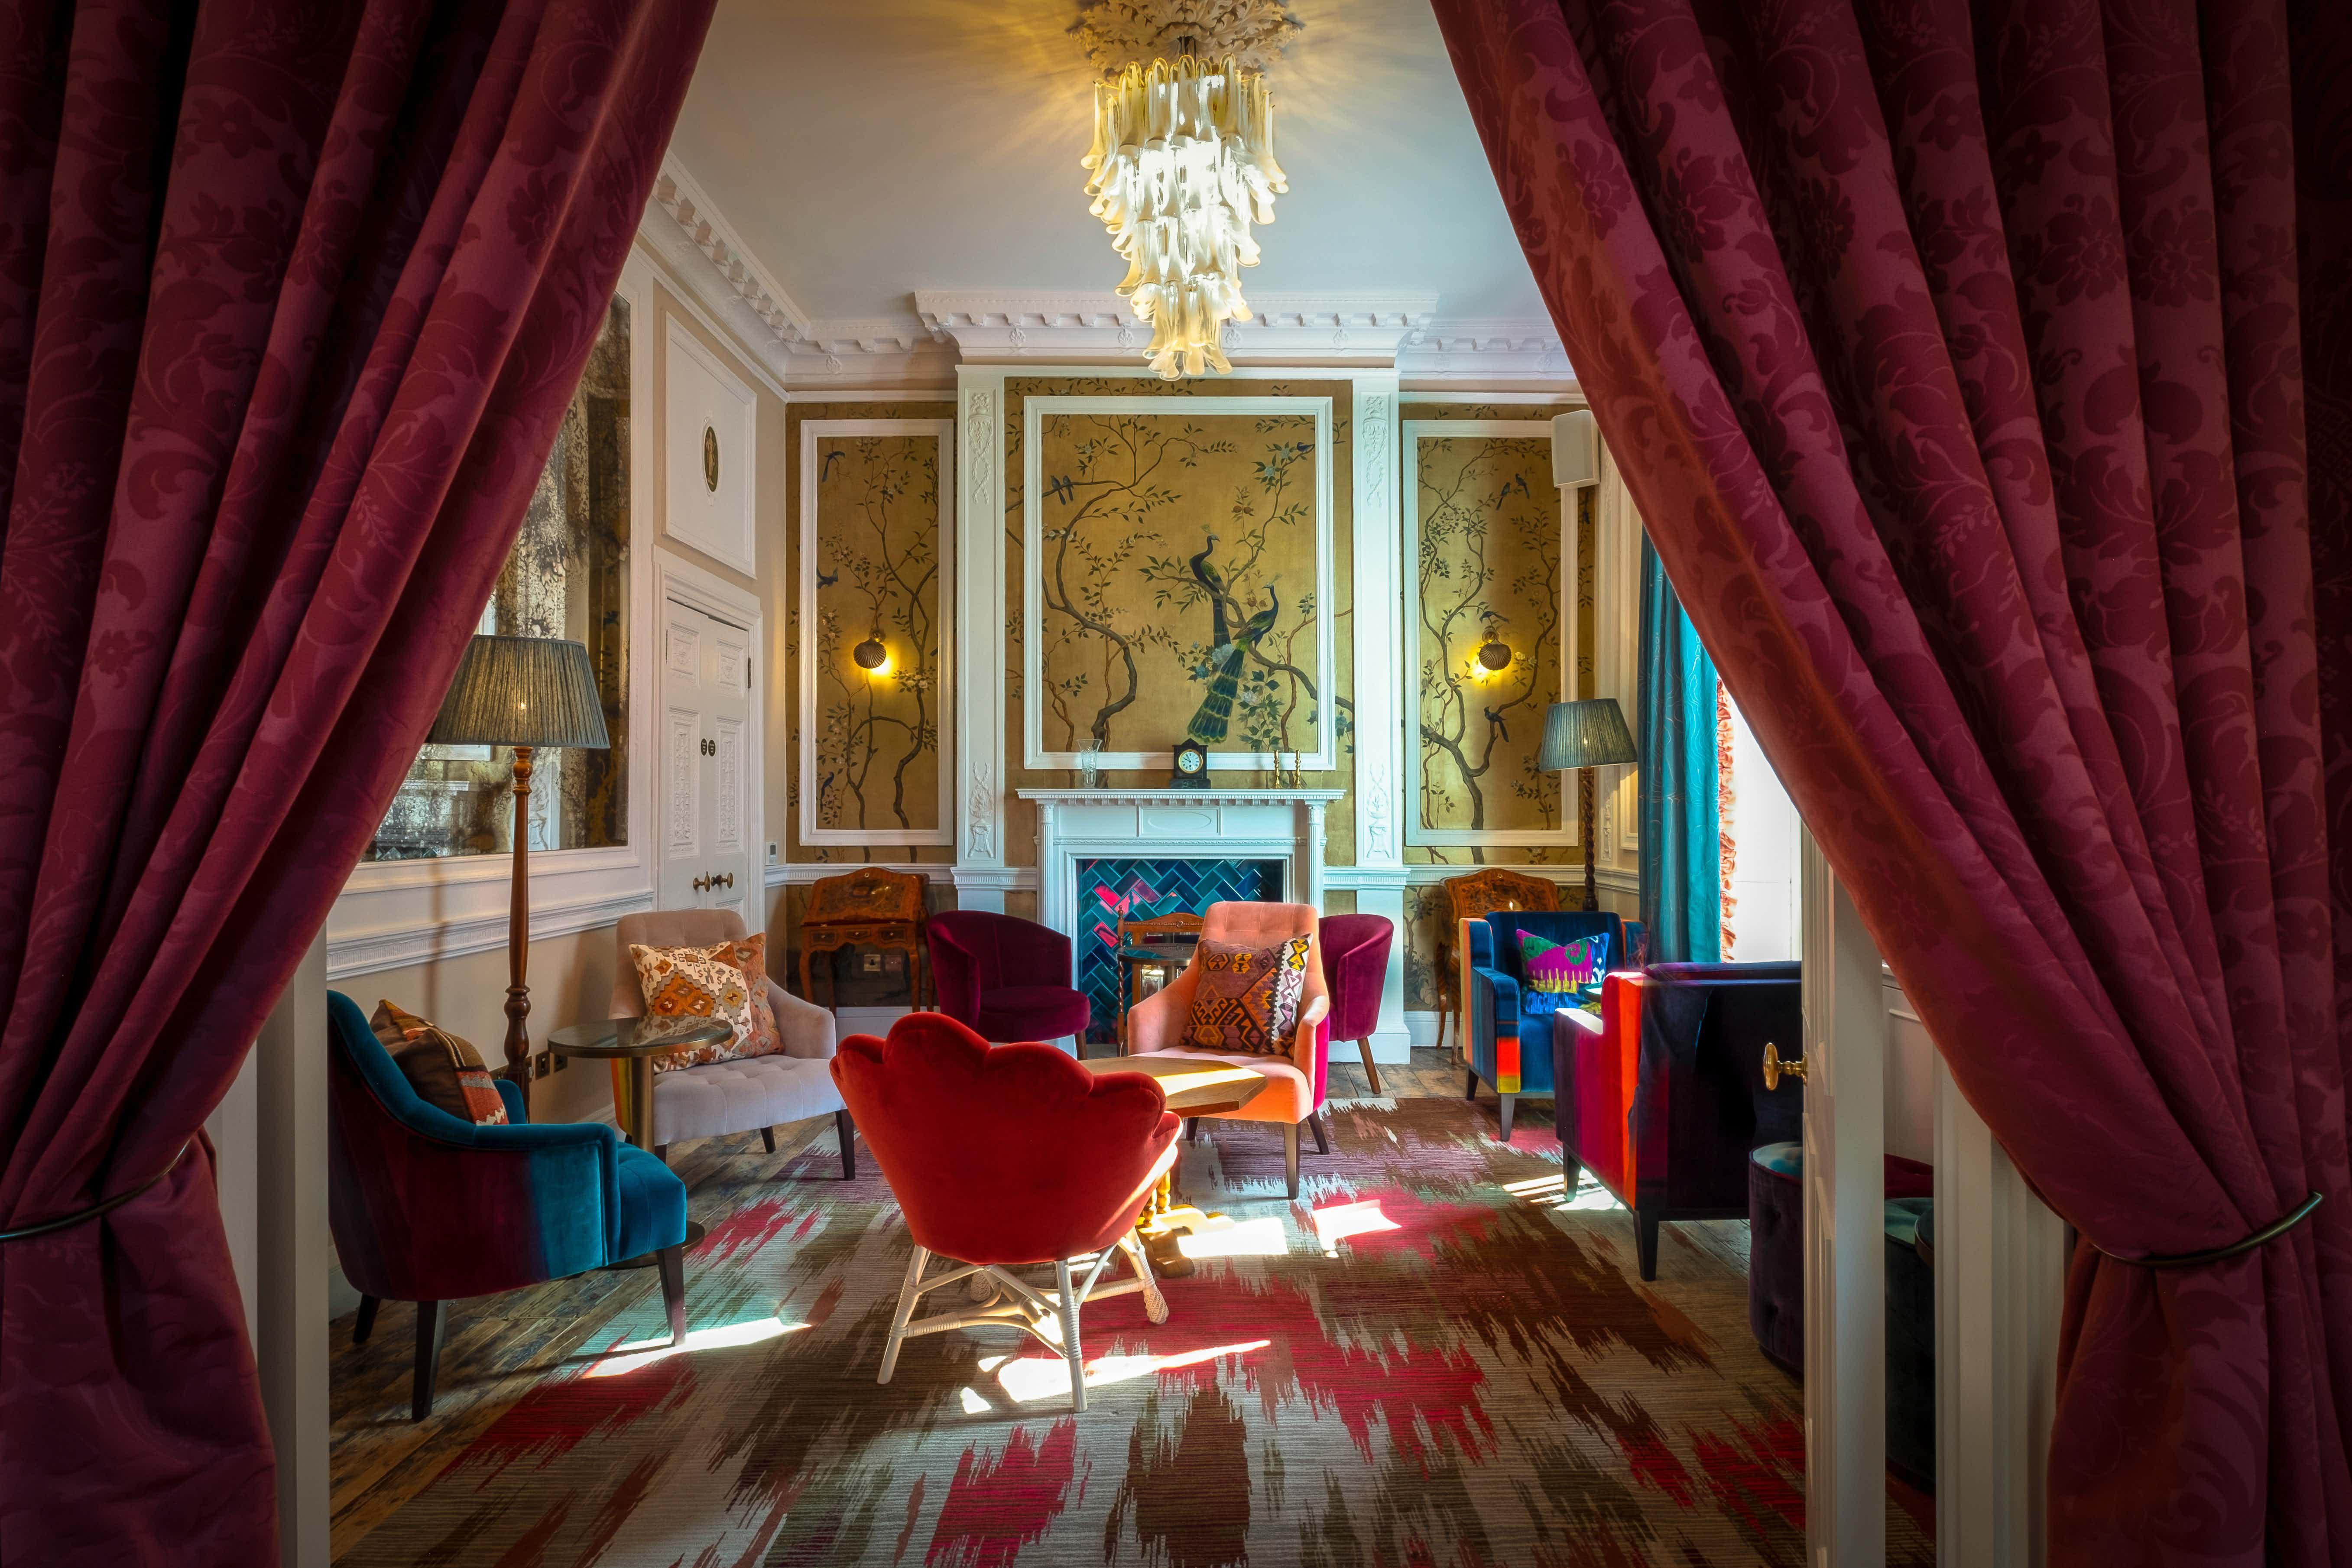 The Secret Salon, Home Grown Club